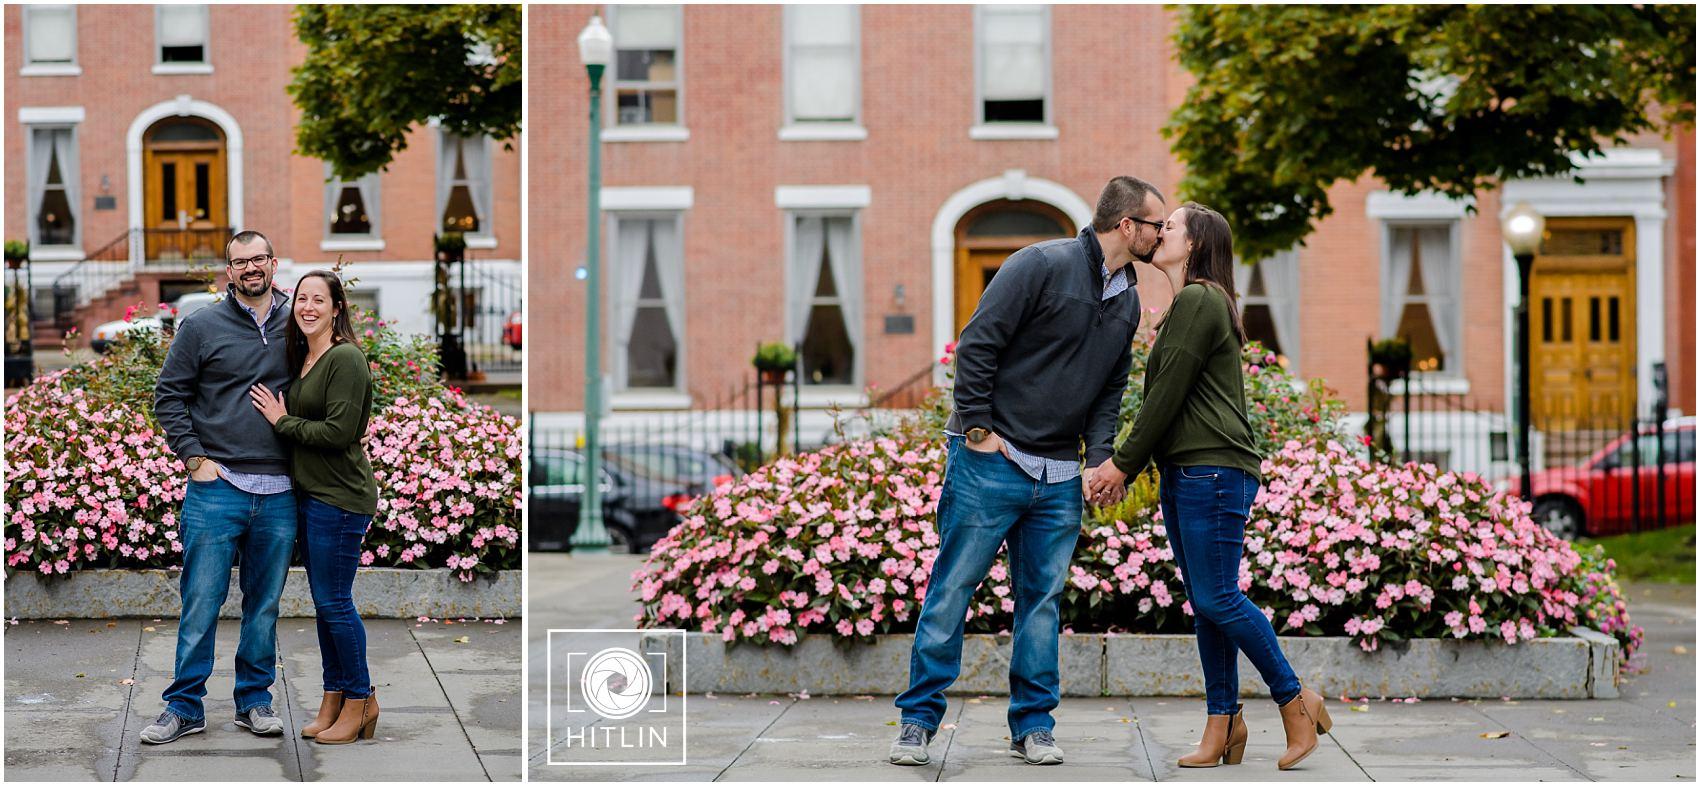 Kristin & Colin's Engagement Session